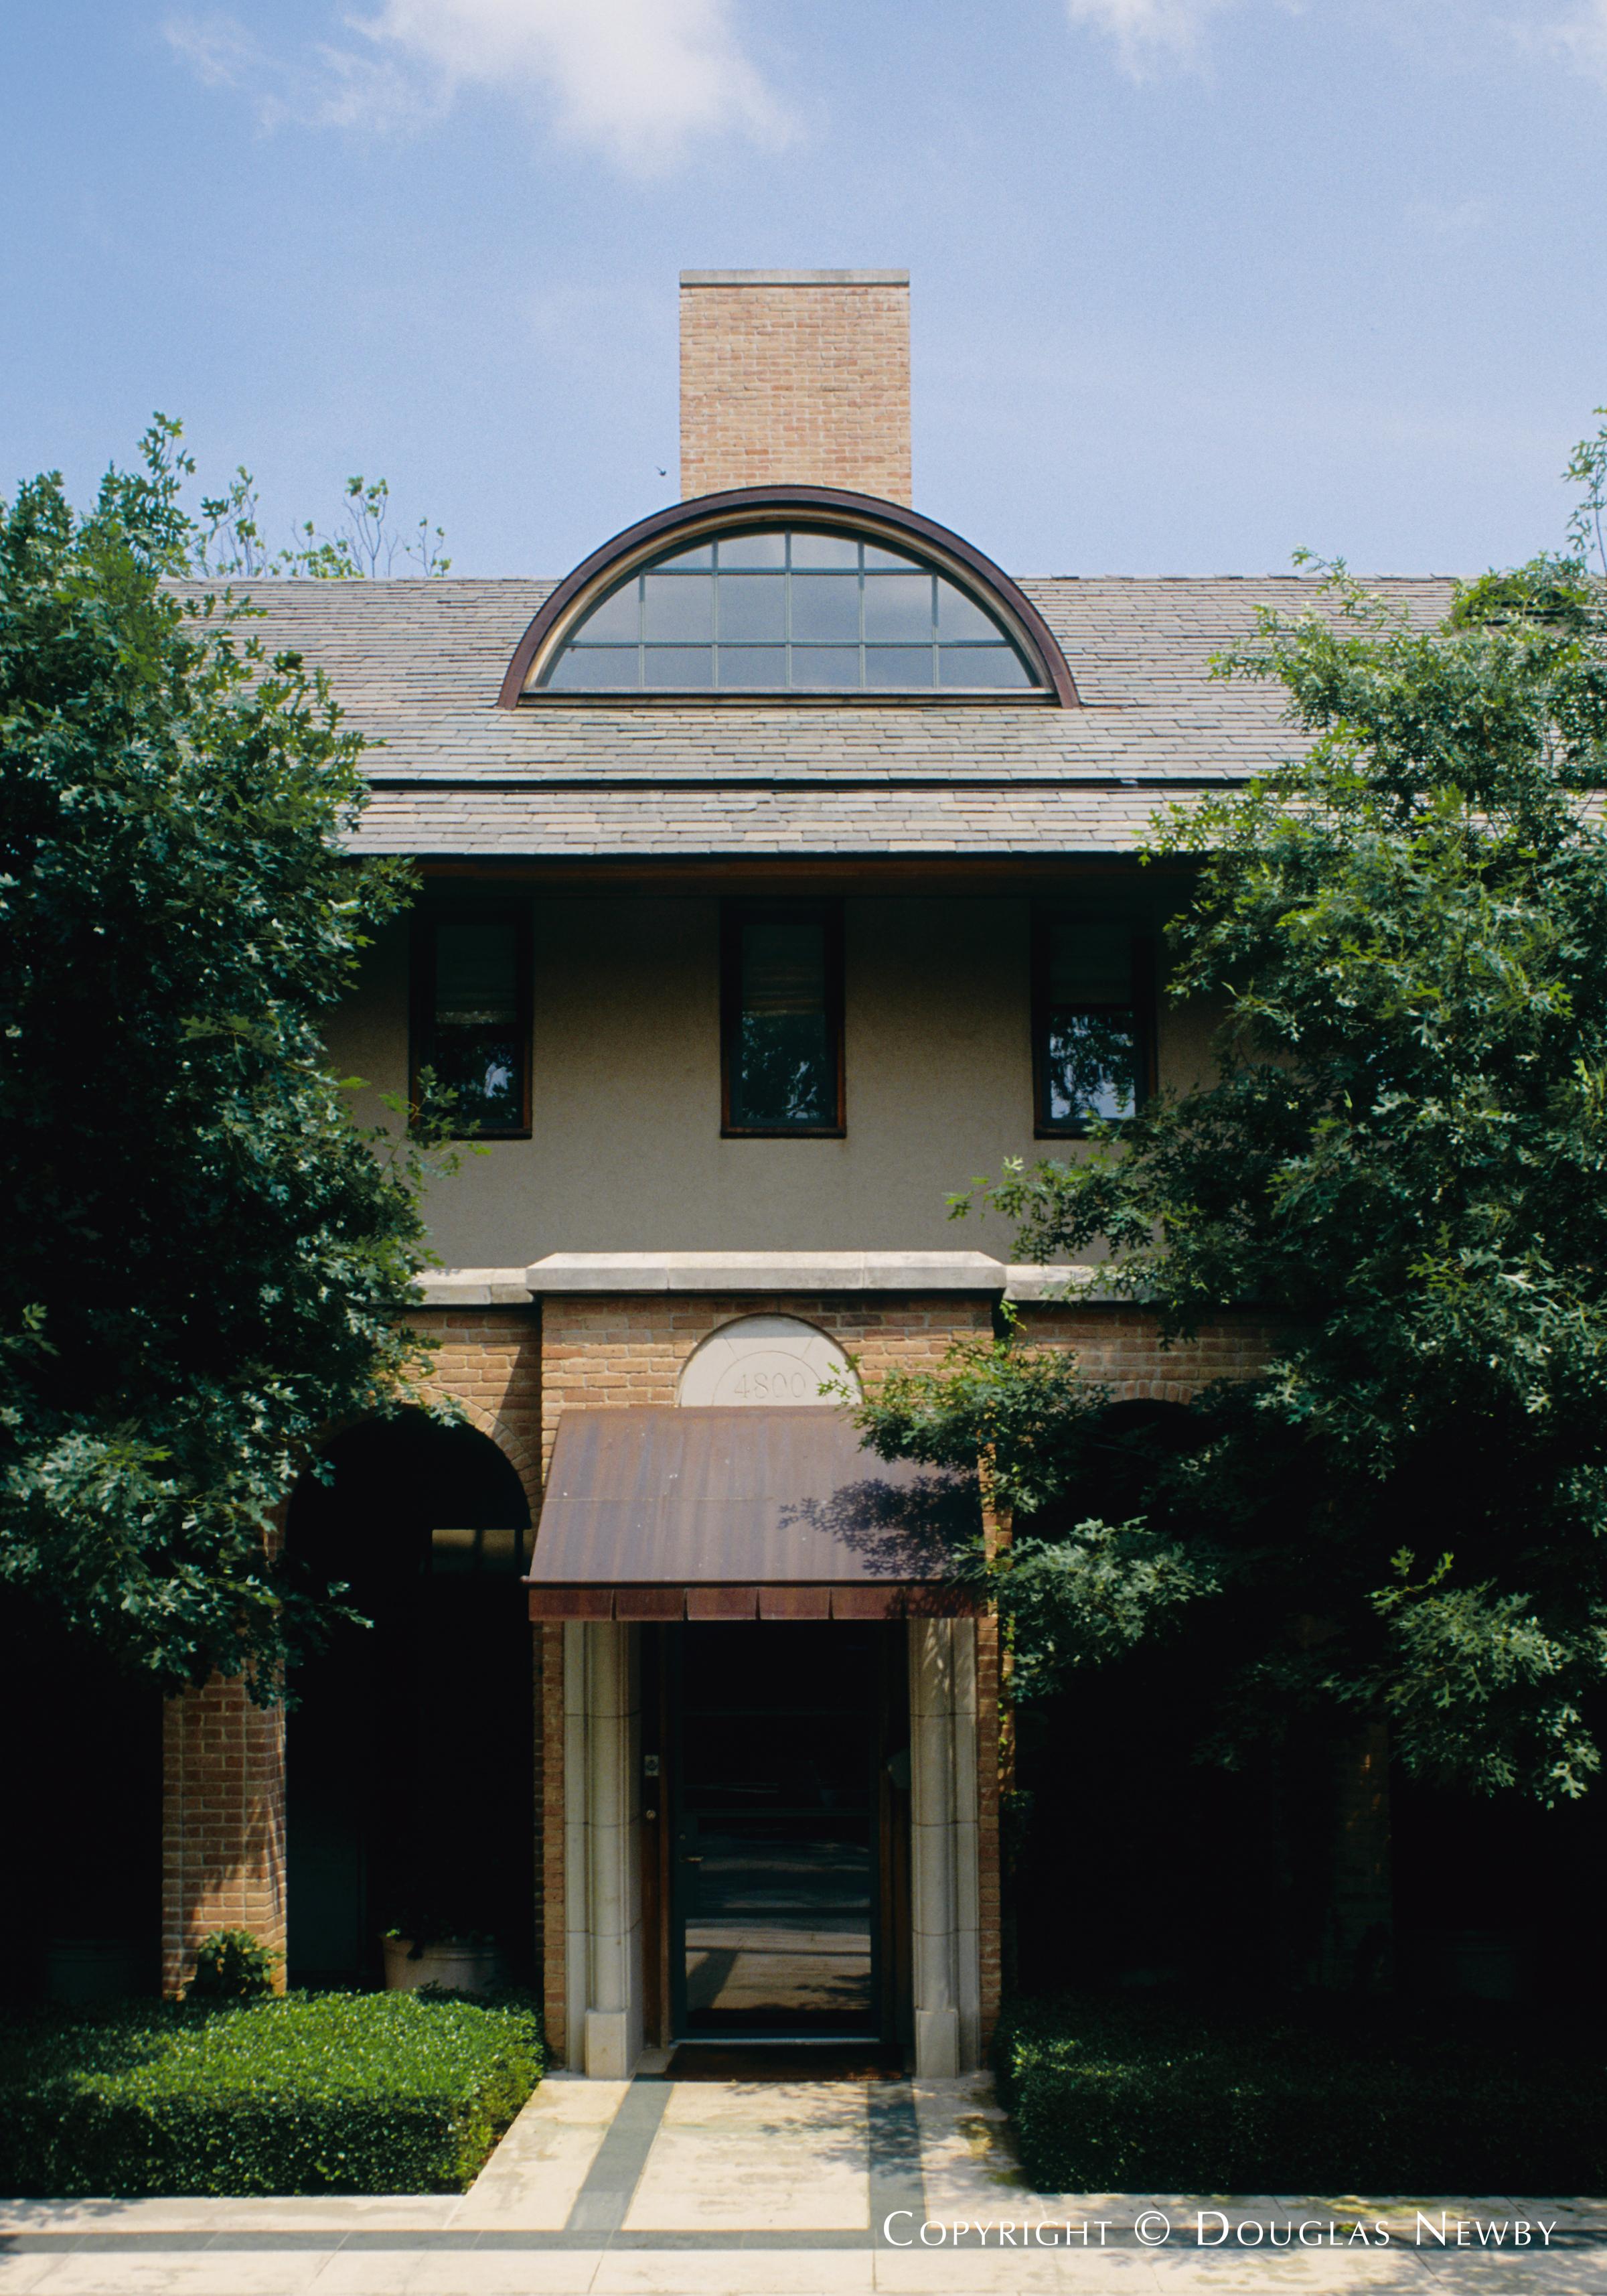 Highland Park Home sitting on 0.918 Acres